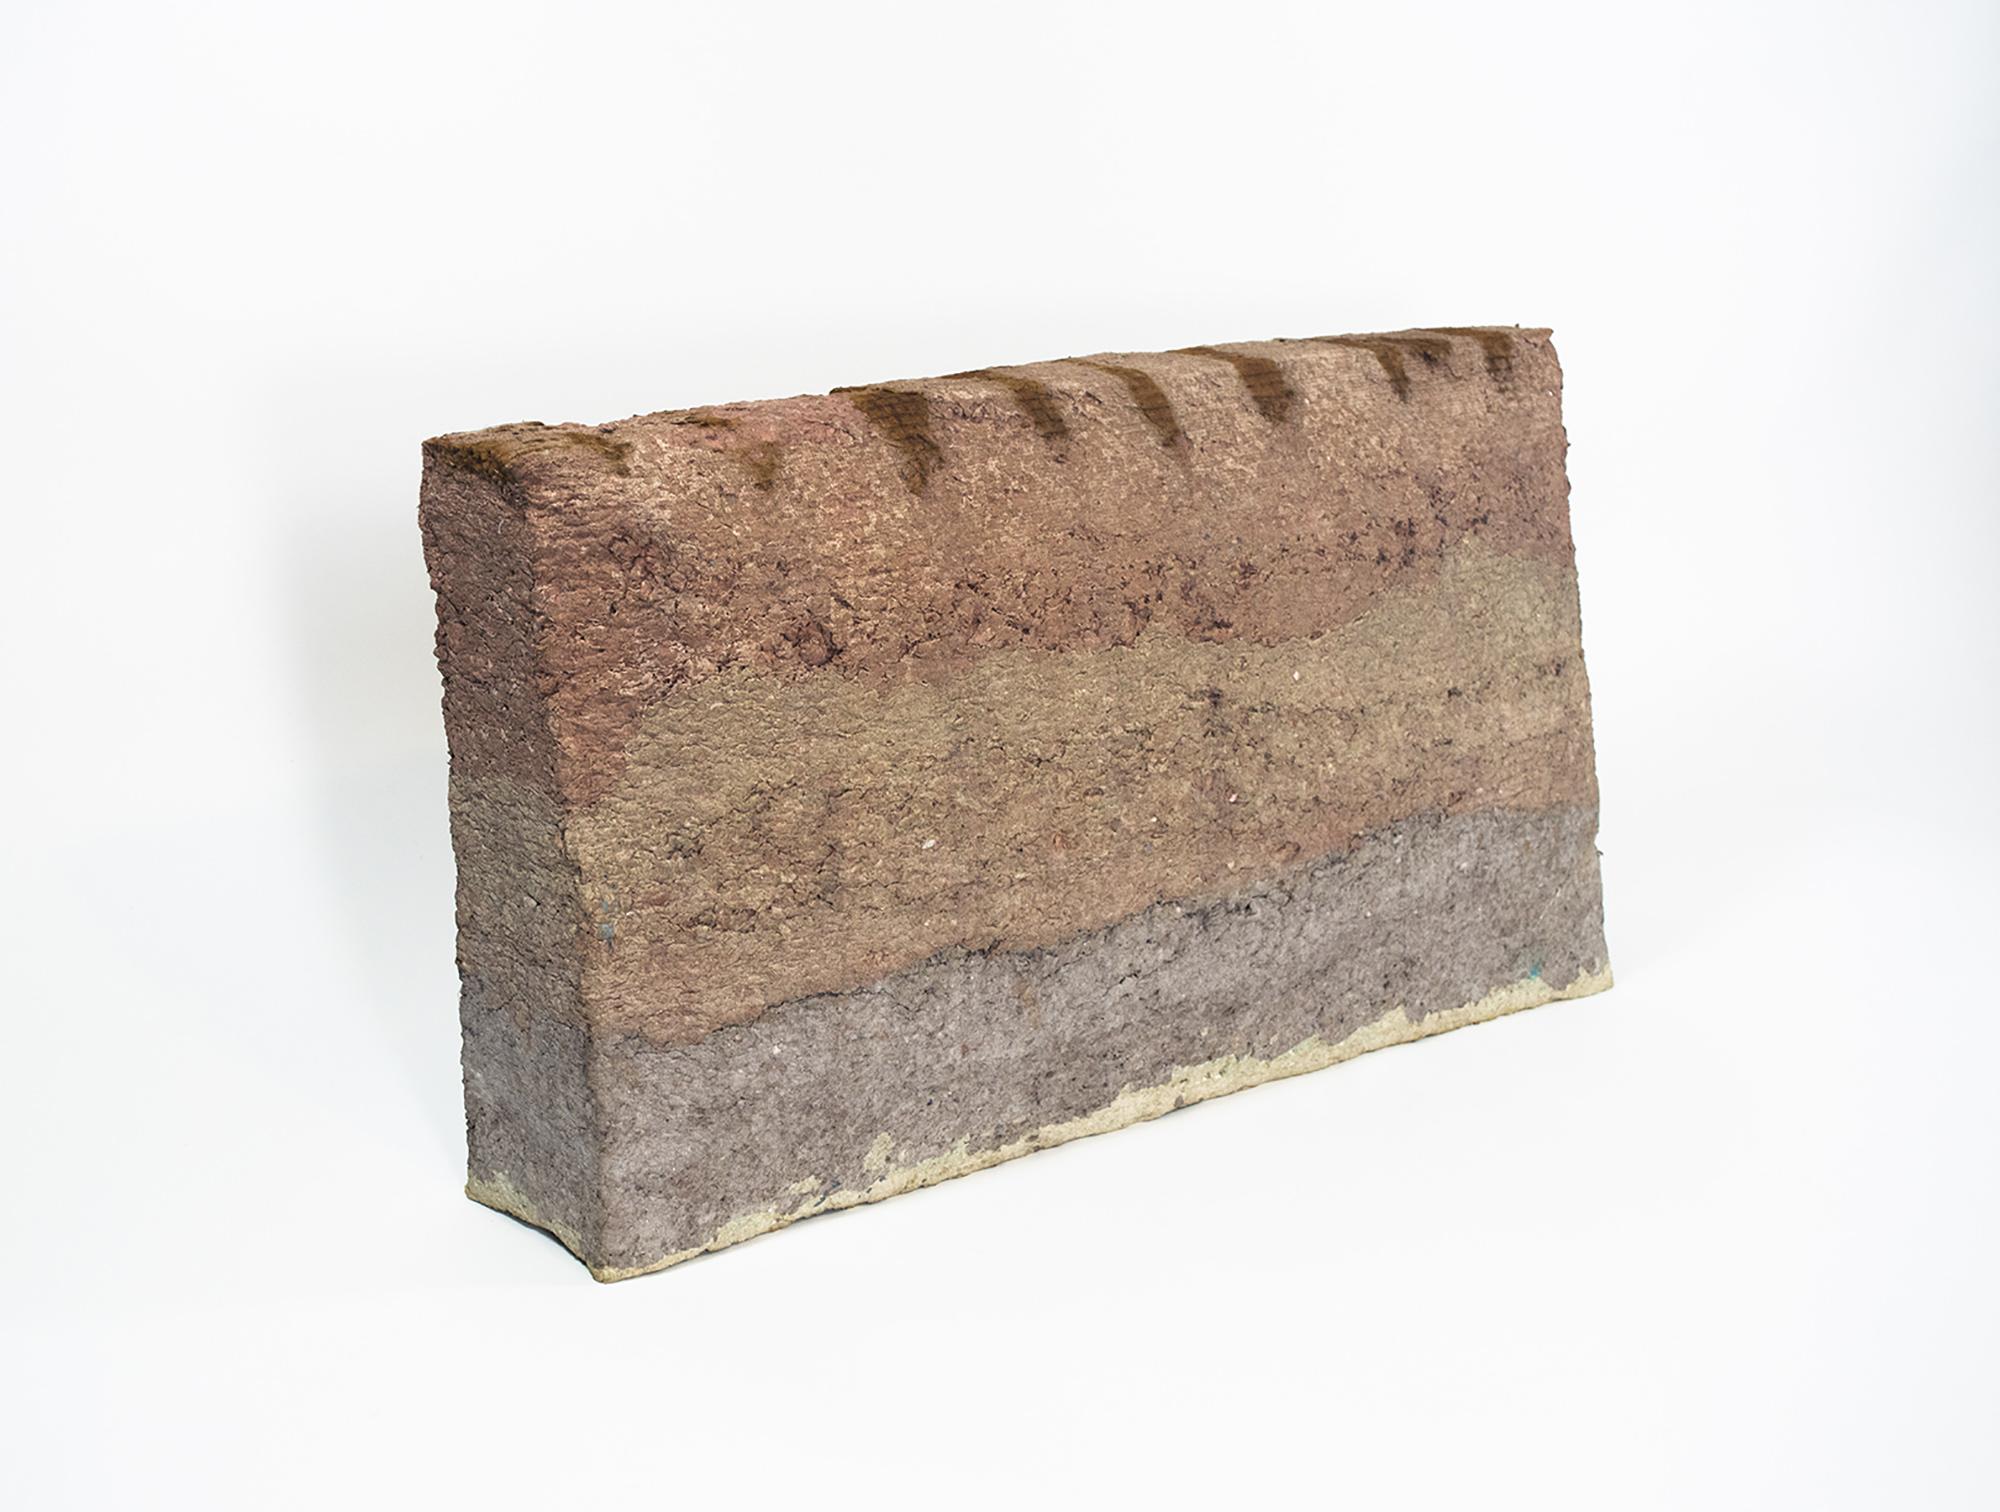 Block , paper pulp, 14 x 20 x 5 in, 2016.